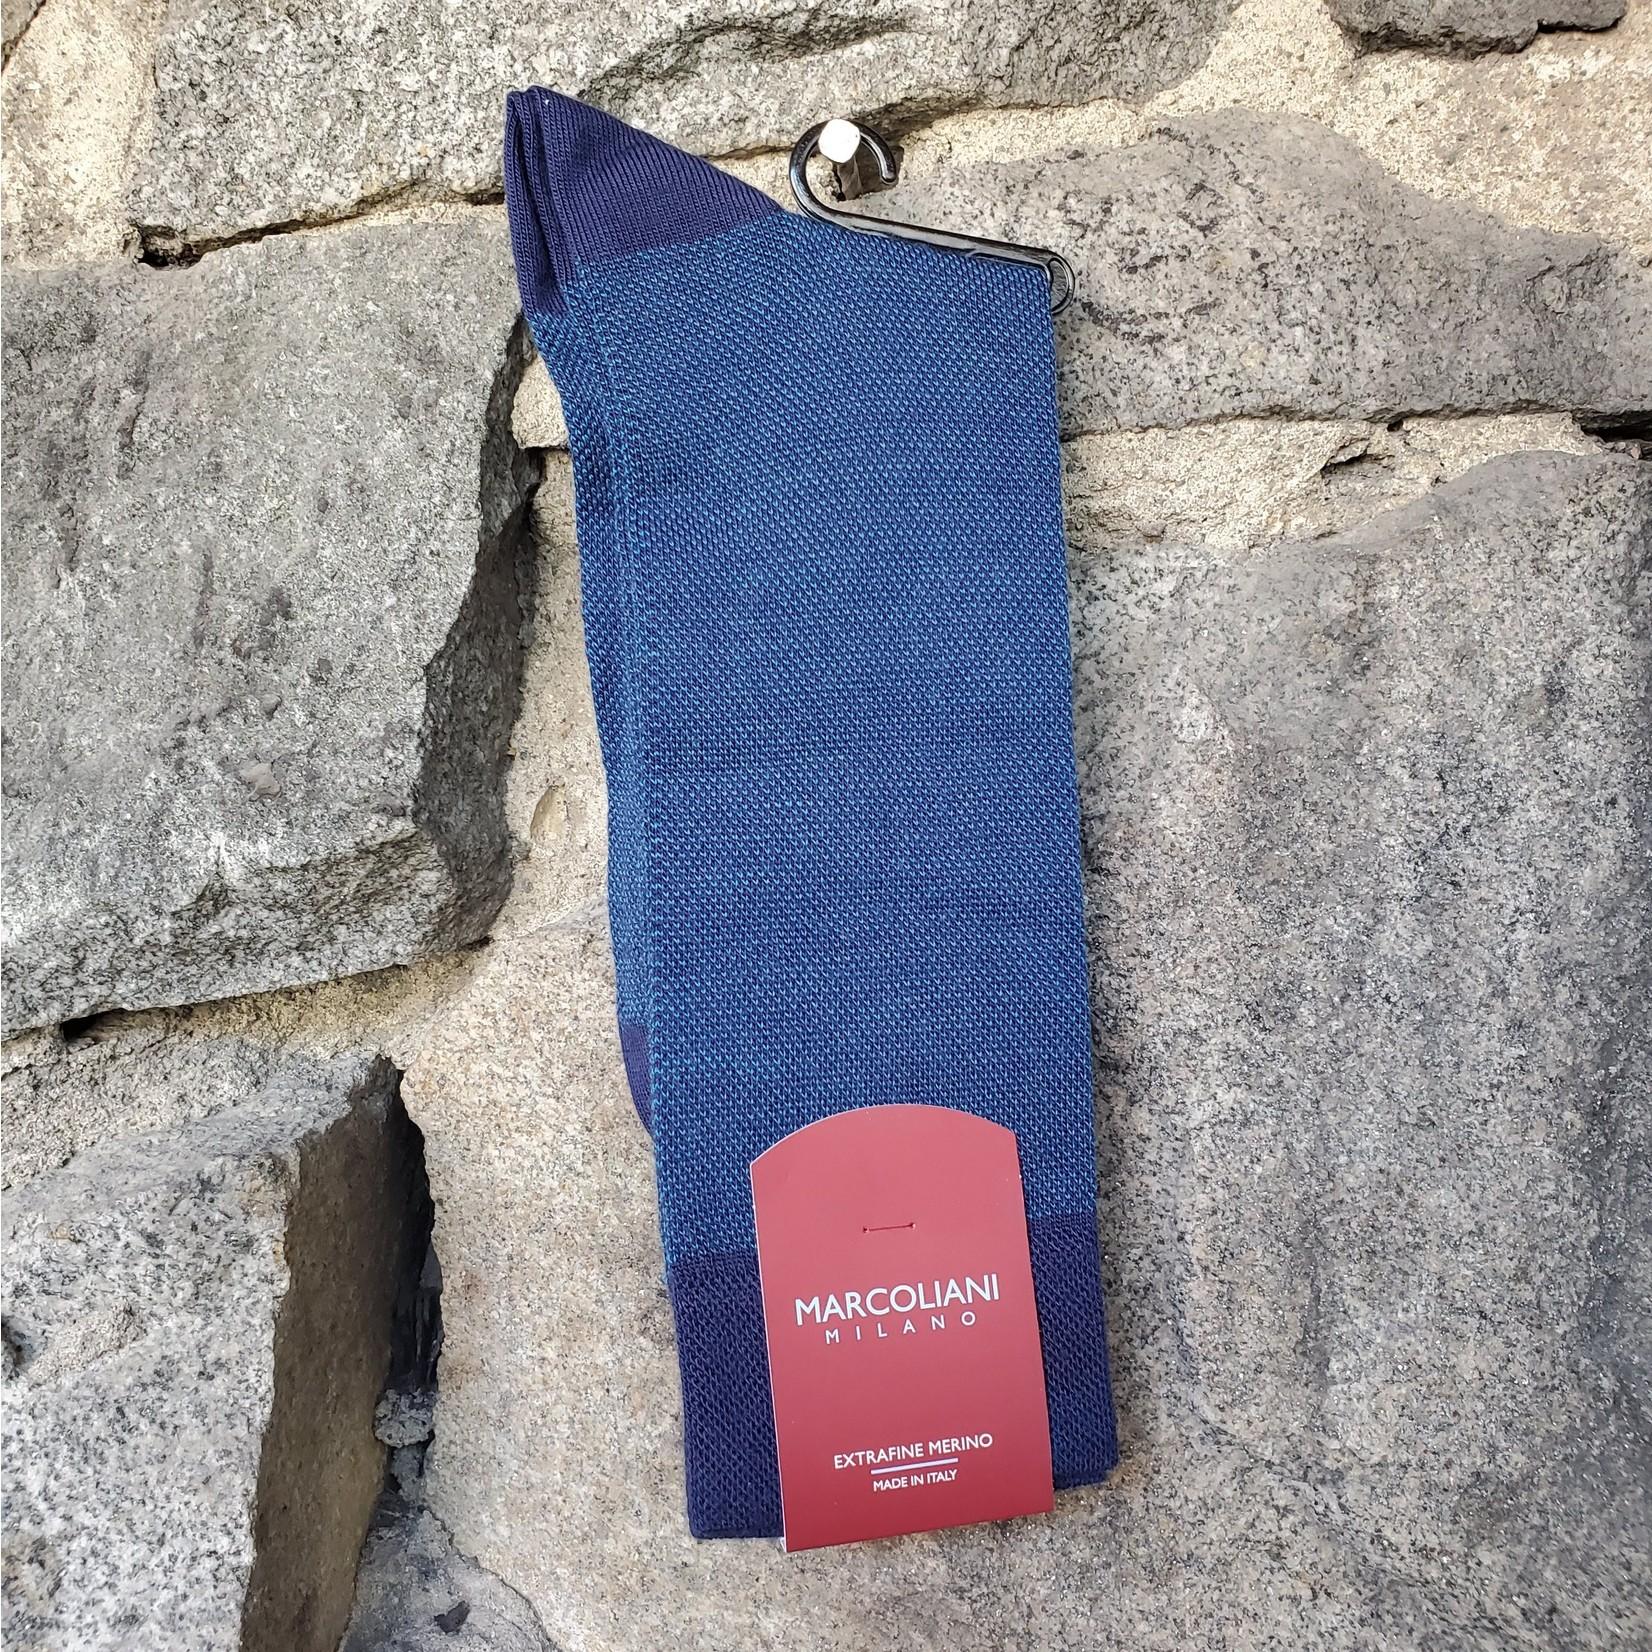 Marcoliani Marcoliani Extrafine Merino Socks - Royal Blue Birdseye